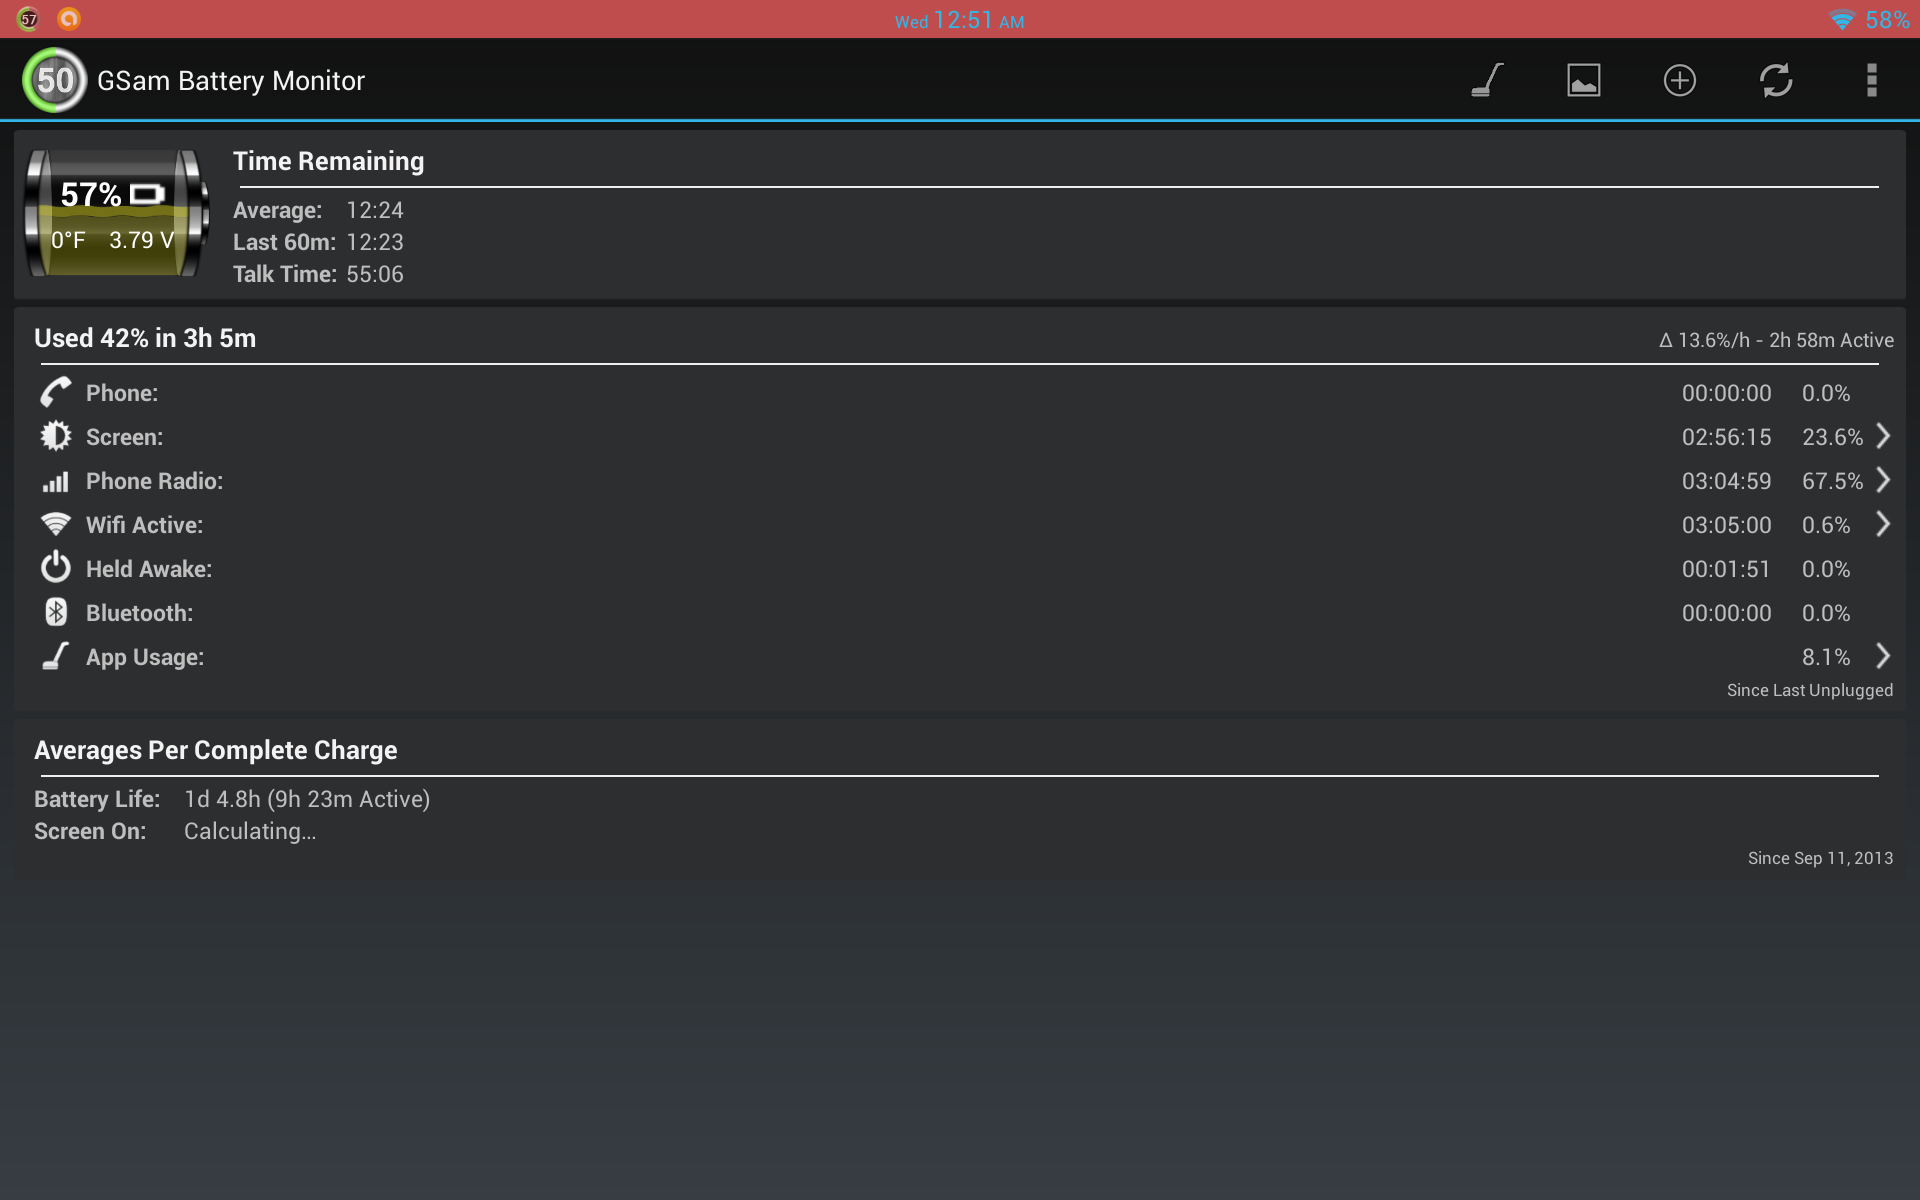 Screenshot_2013-12-04-00-51-26.png